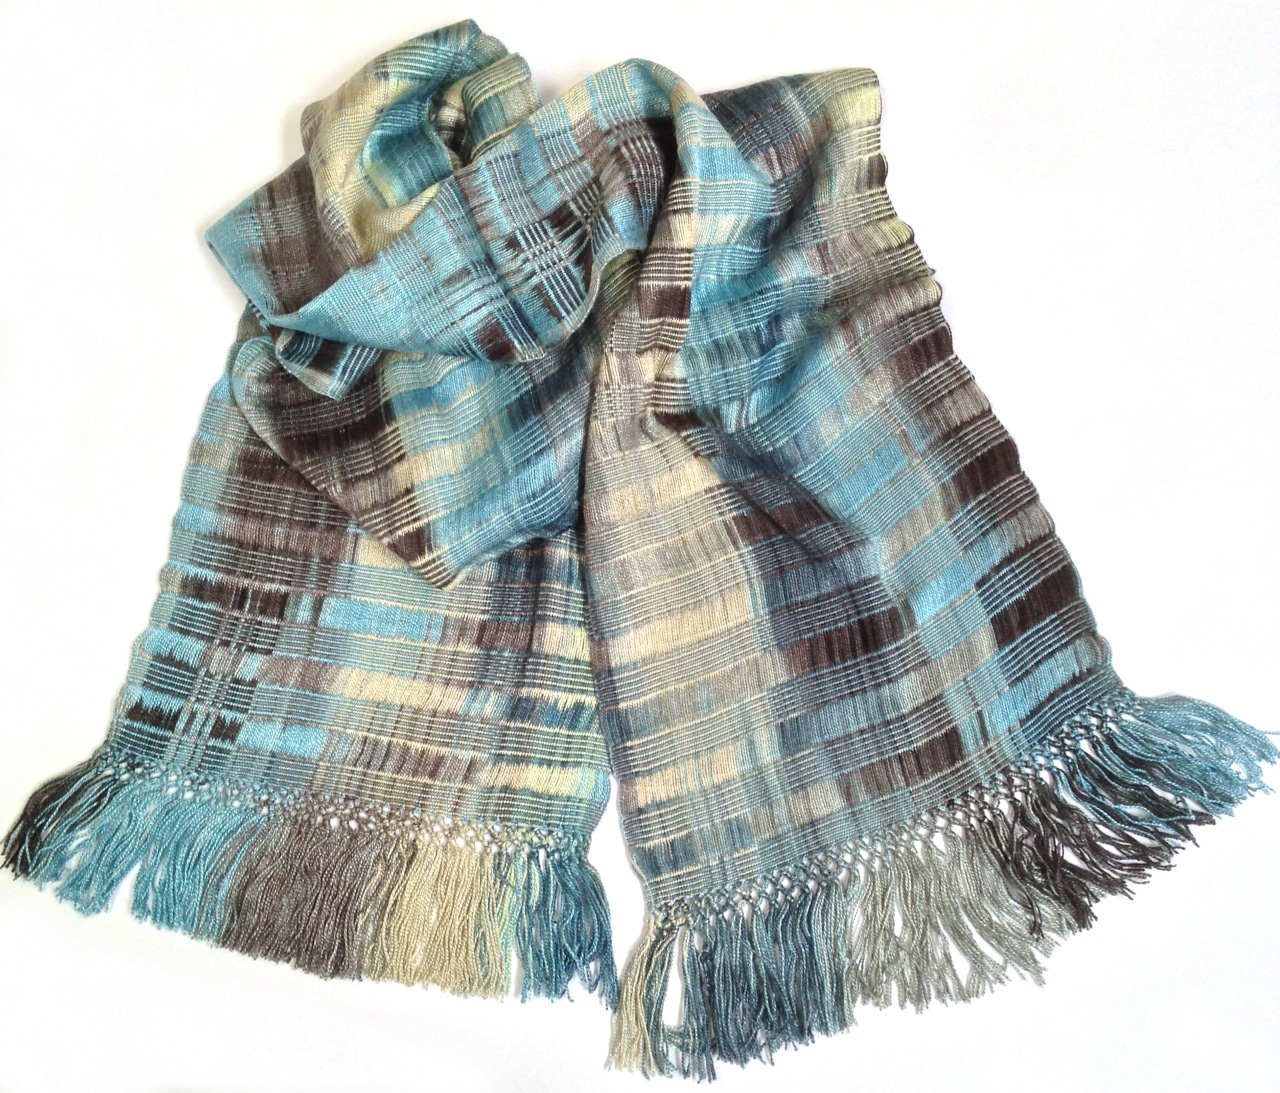 Denim (Blue, Black, Cream, Gray) - Lightweight Bamboo Open-Weave Handwoven Scarf 8 x 68